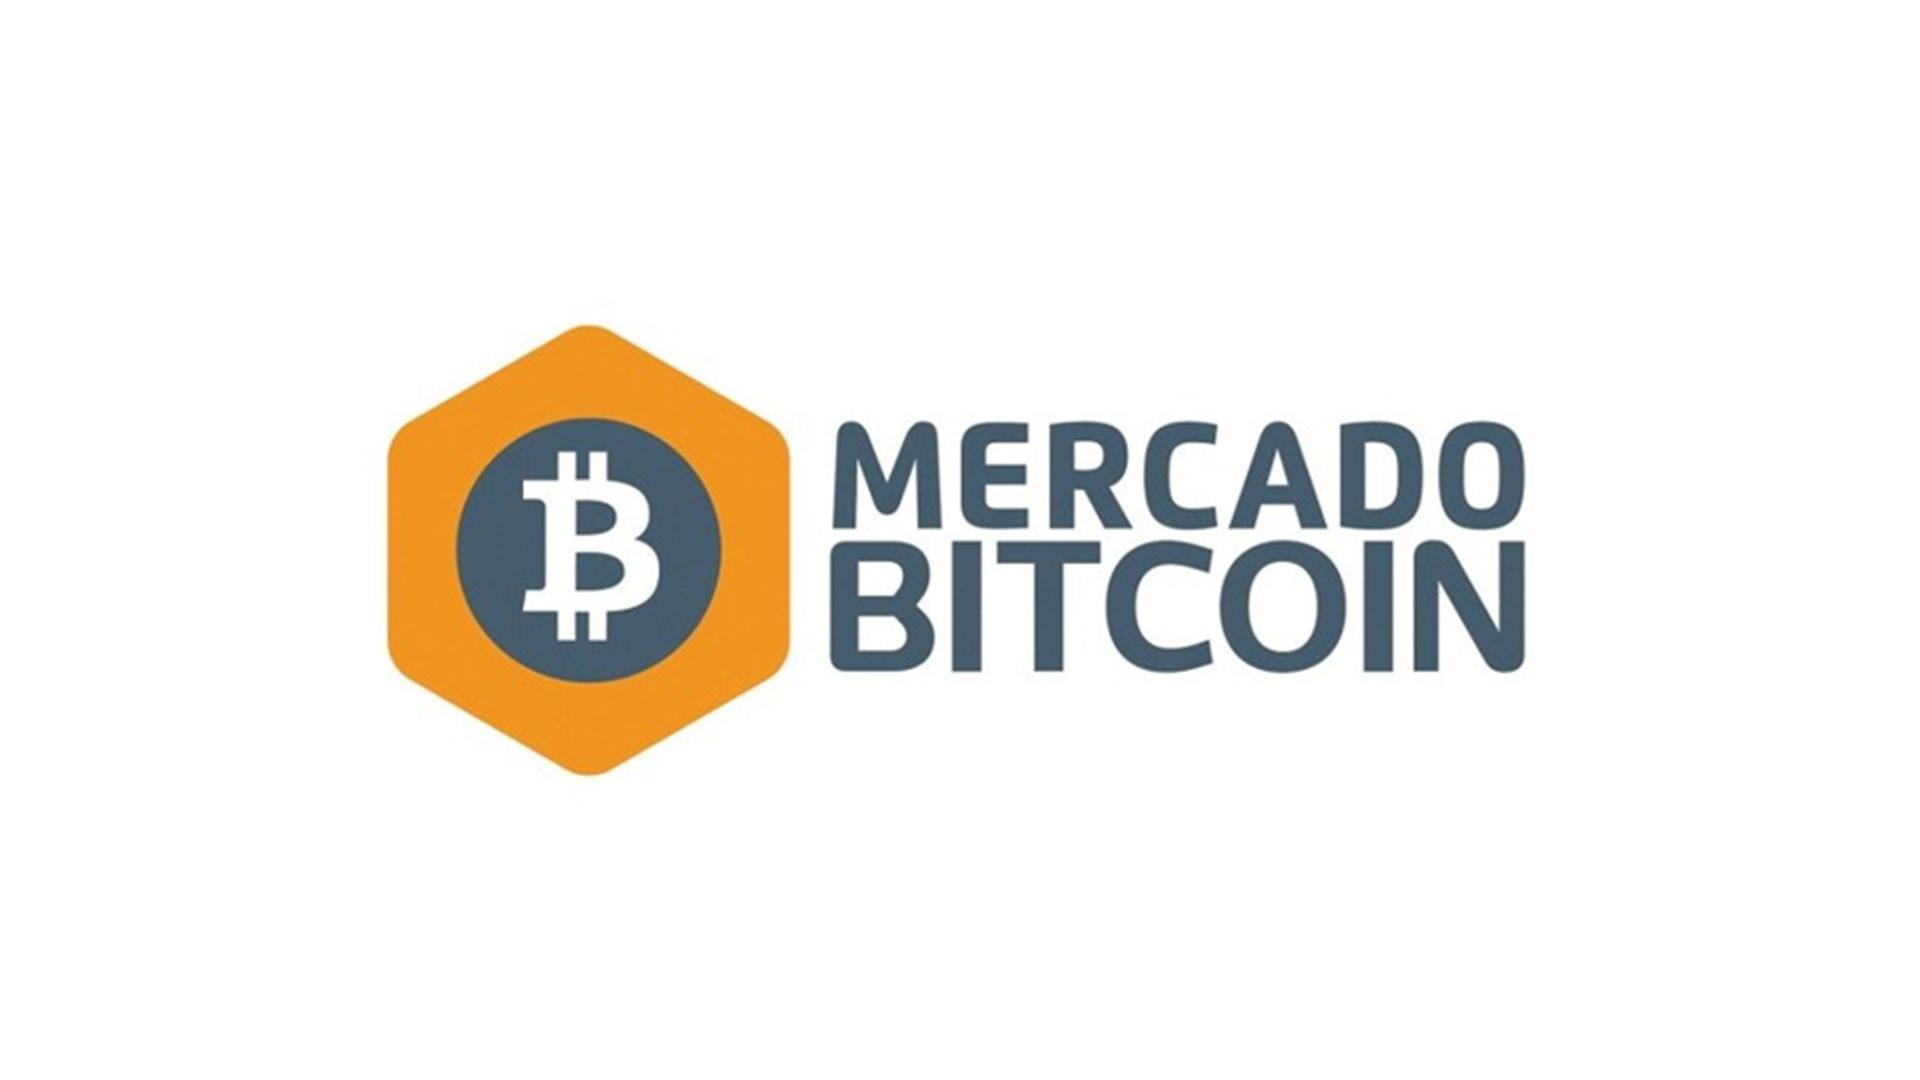 (Source: Bitcoin Market / Reproduction)